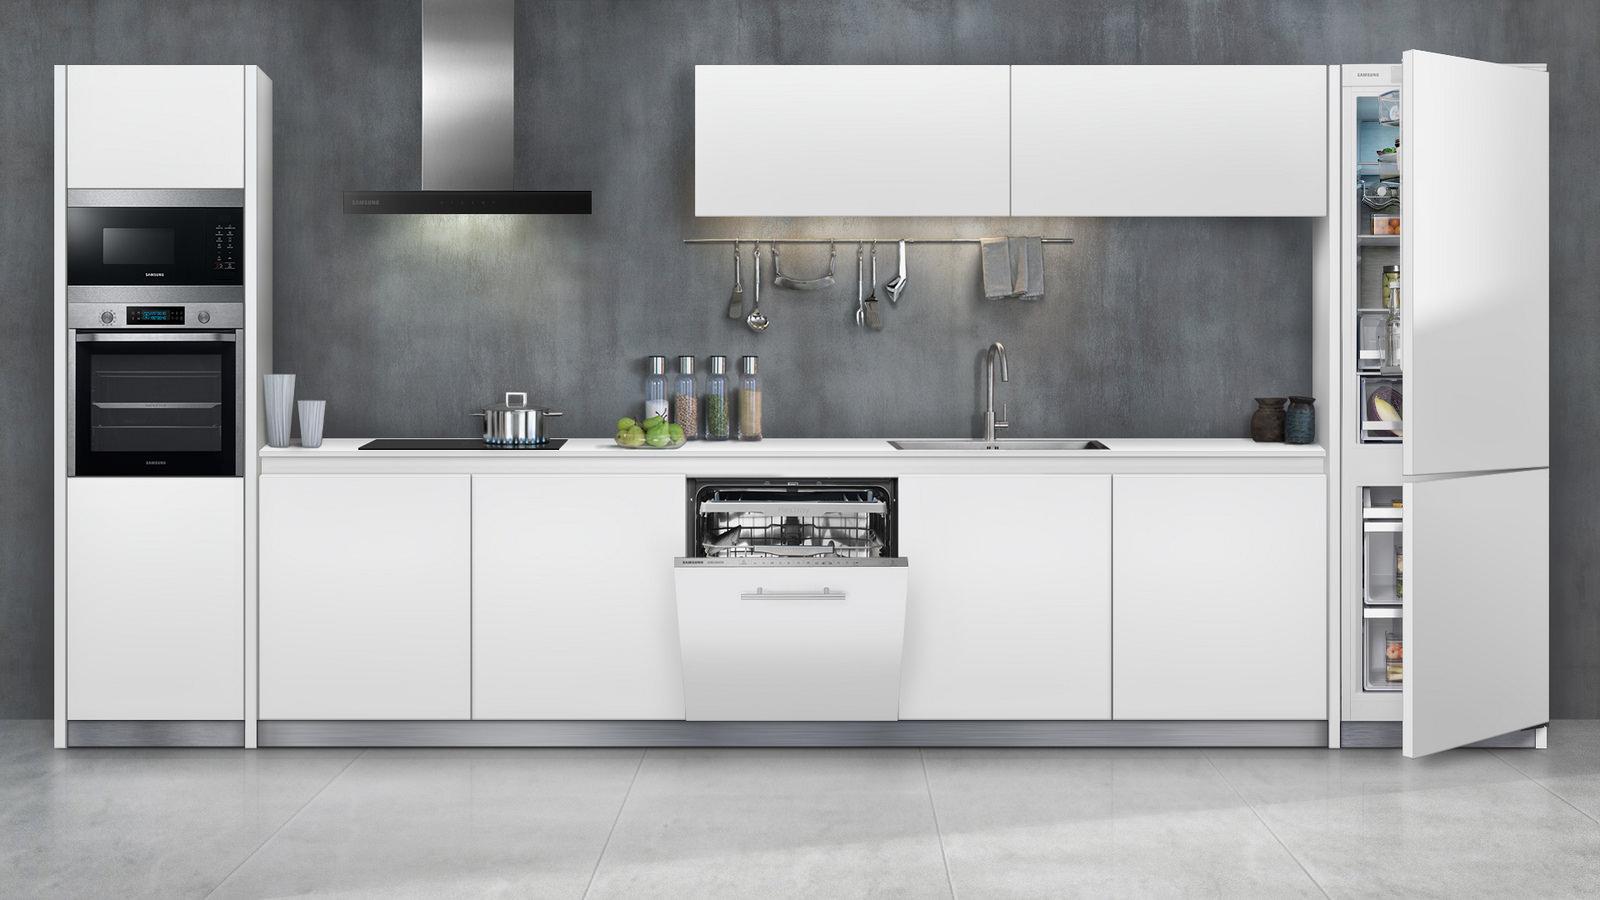 Samsung z kompletem smart zabudowy AGD do kuchnia -> Kuchnia Elektryczna Do Zabudowy Samsung